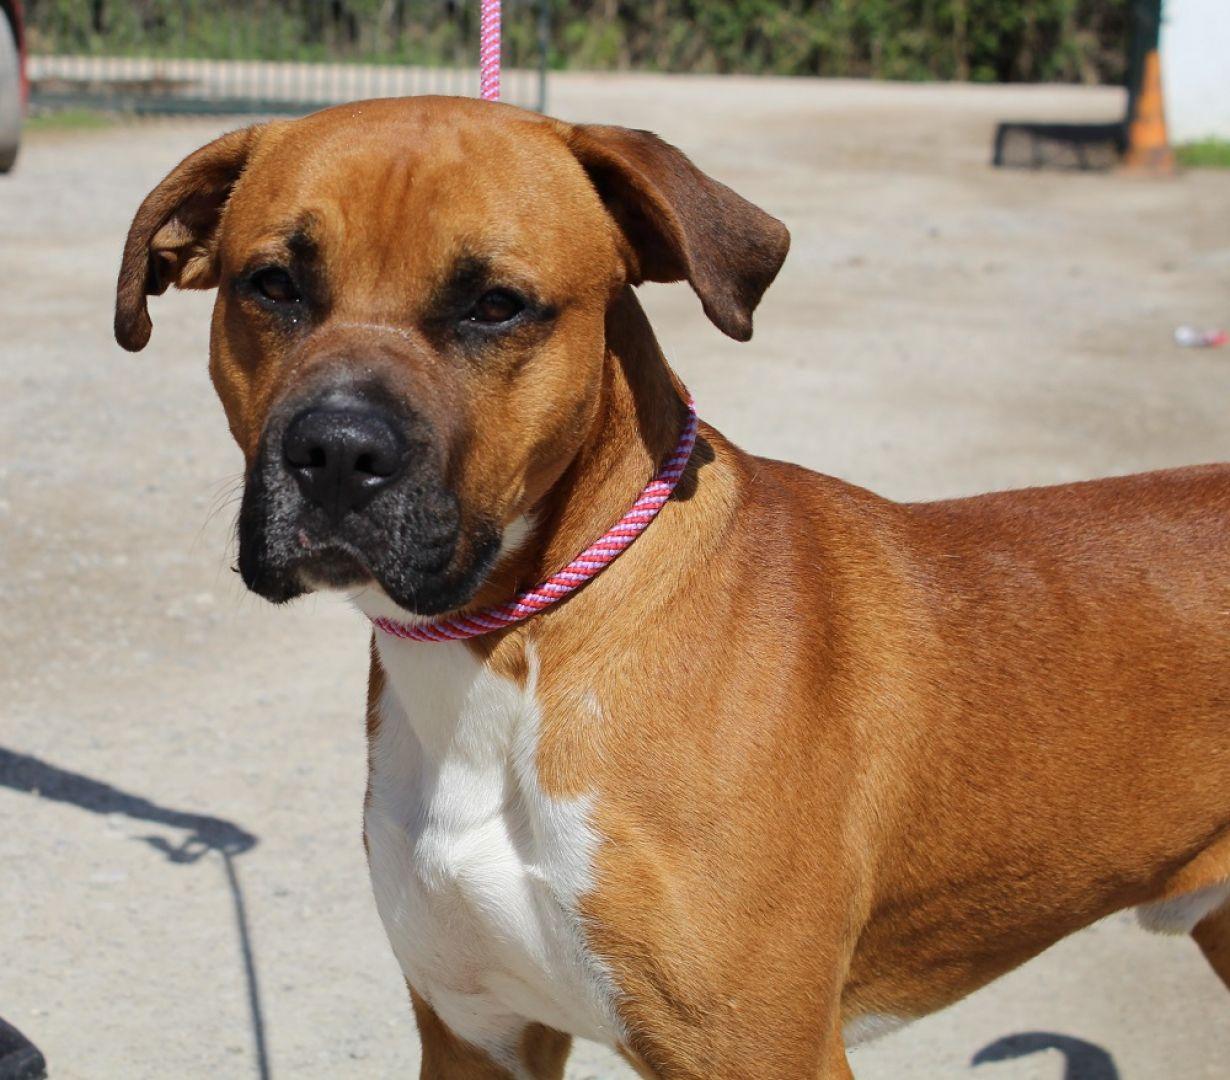 Lexi perro adopci n cruce adulto 2 a os perrera de los barrios - Perrera de vilafranca ...